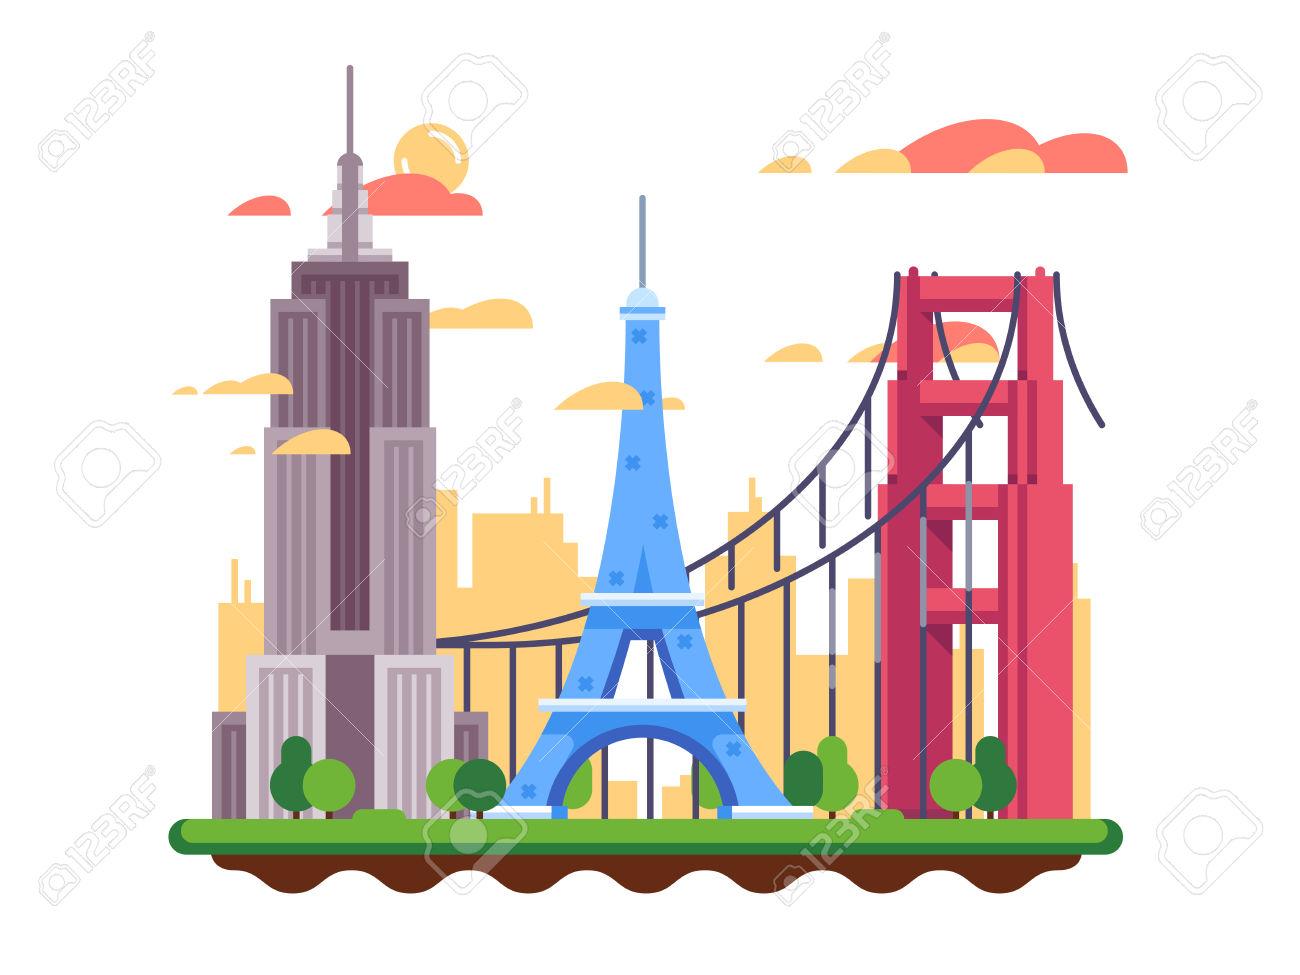 Golden Gate Bridge Clipart Free Download Best Diagram Of The 1300x975 Building